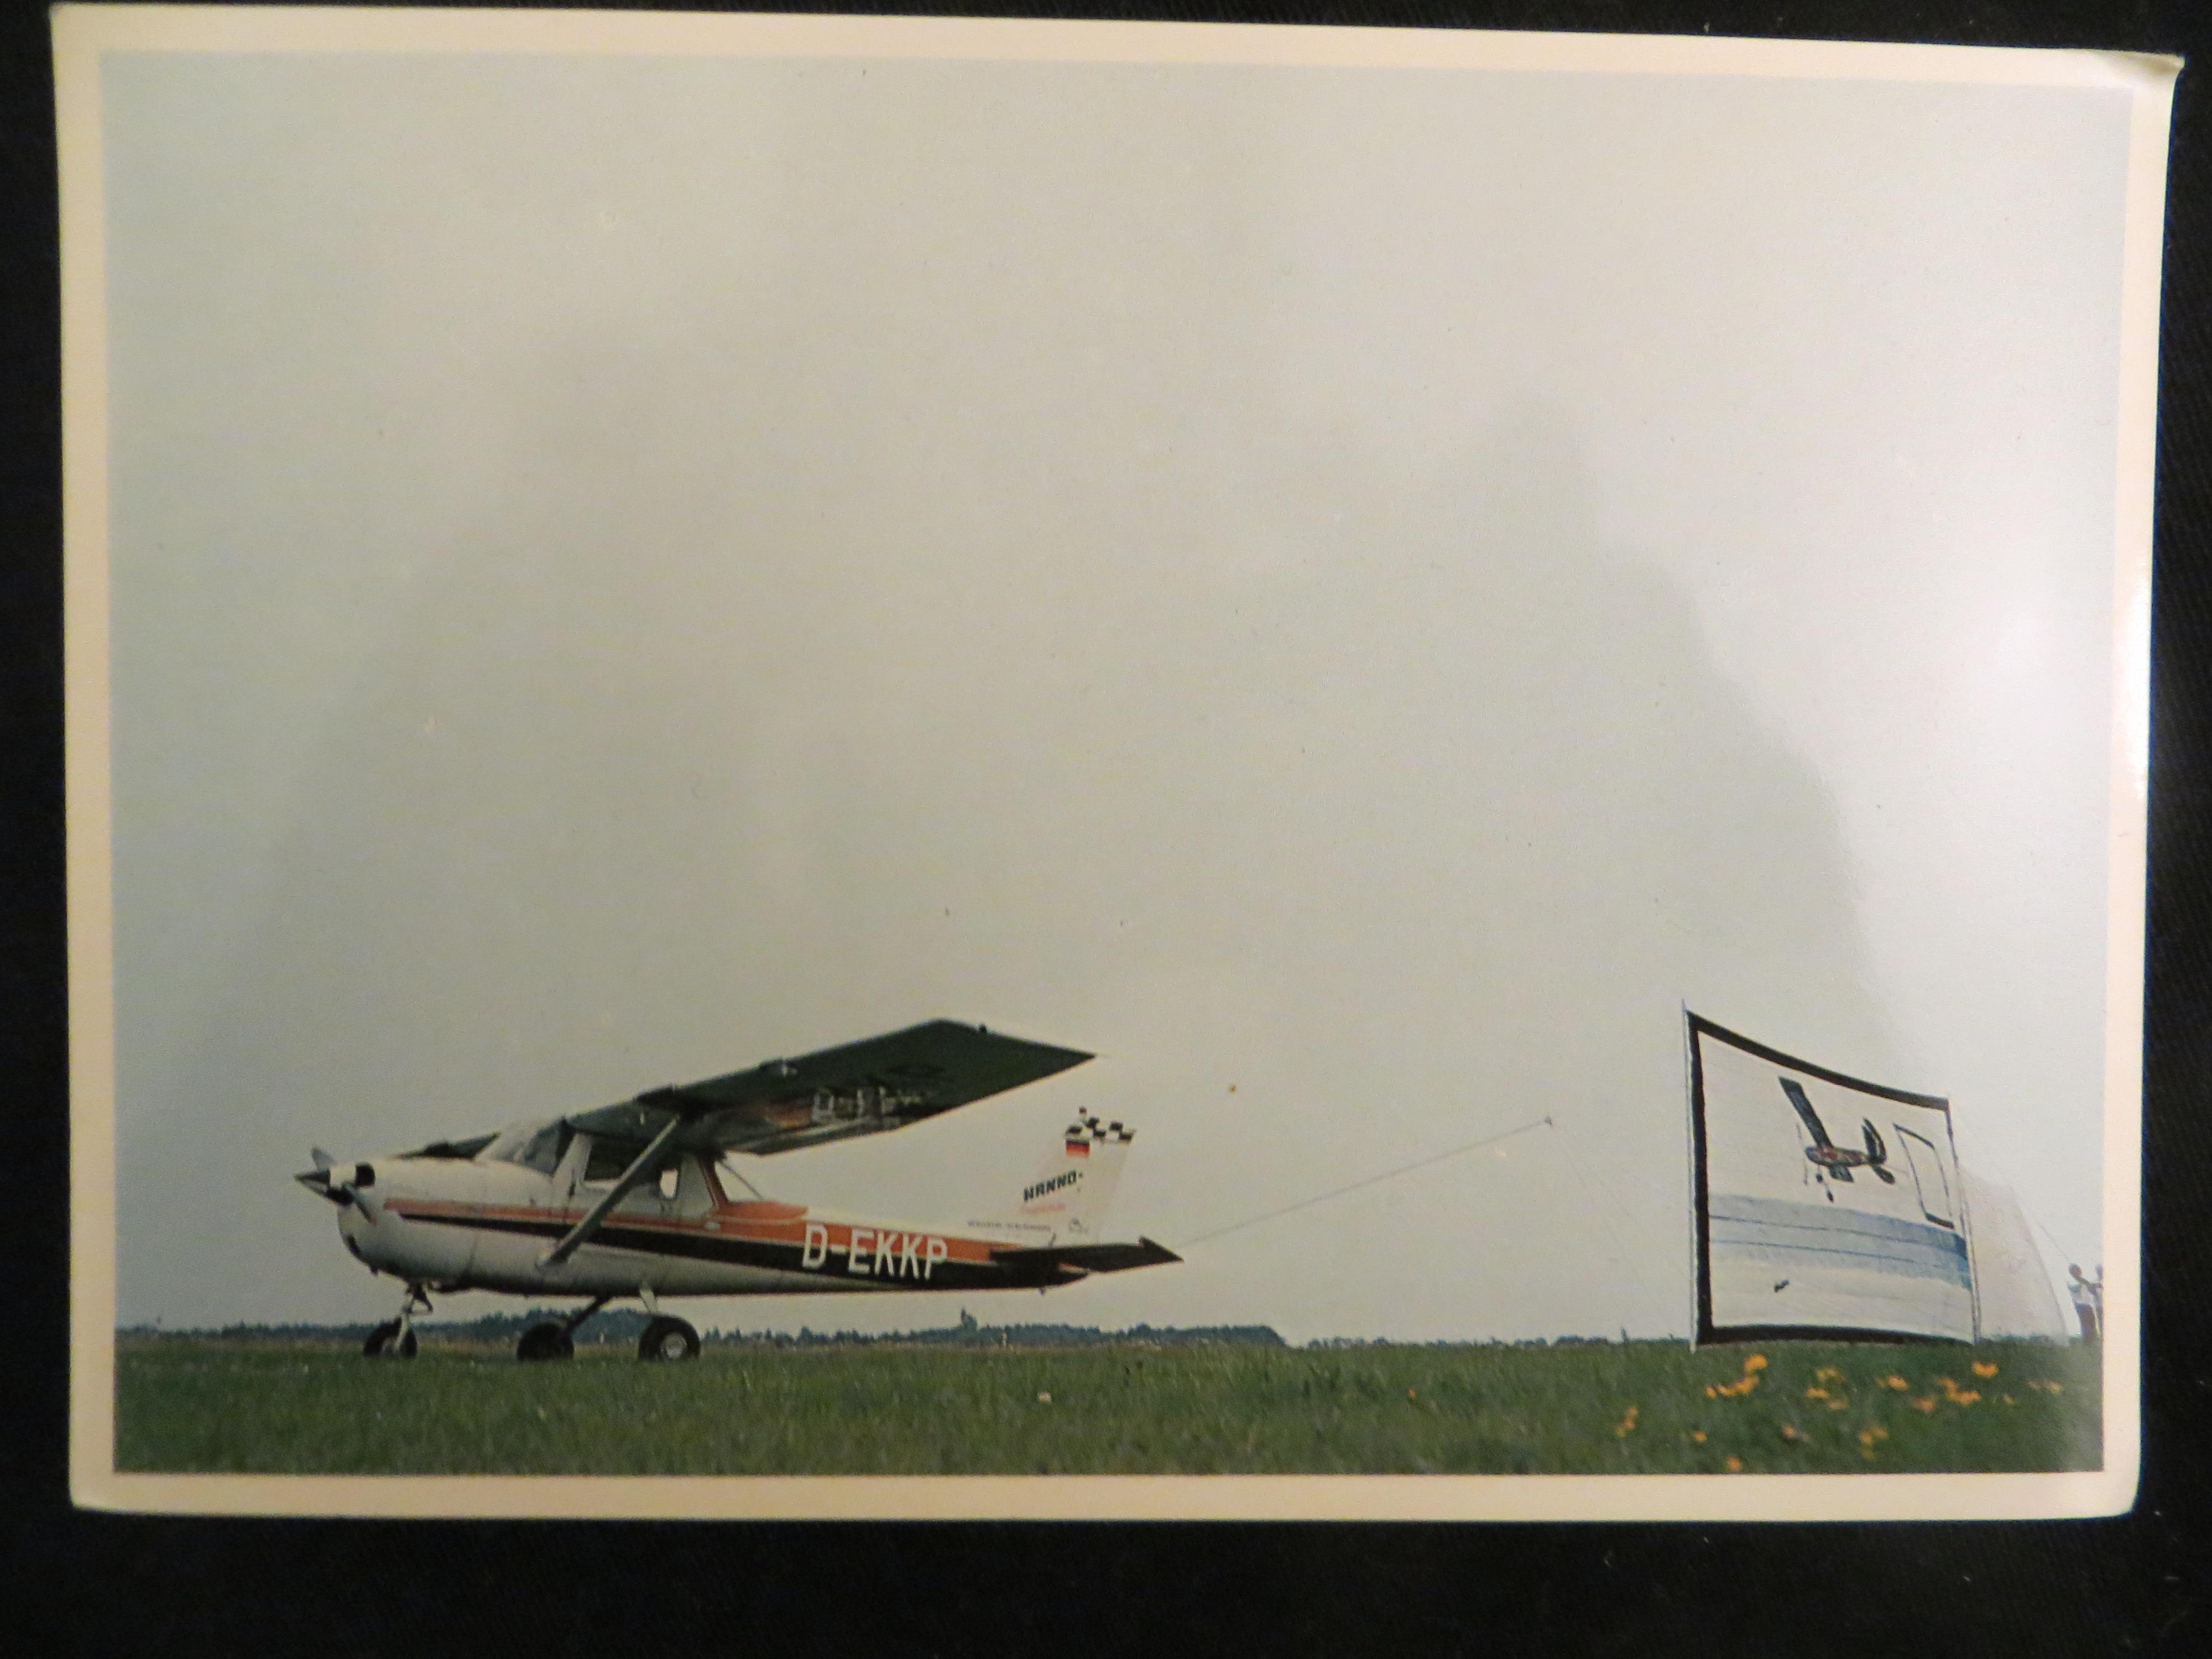 Dietmar Moews 1977 Sky Applique Flying-Flag-object 6/35 Meter Langenhagen / Kassel